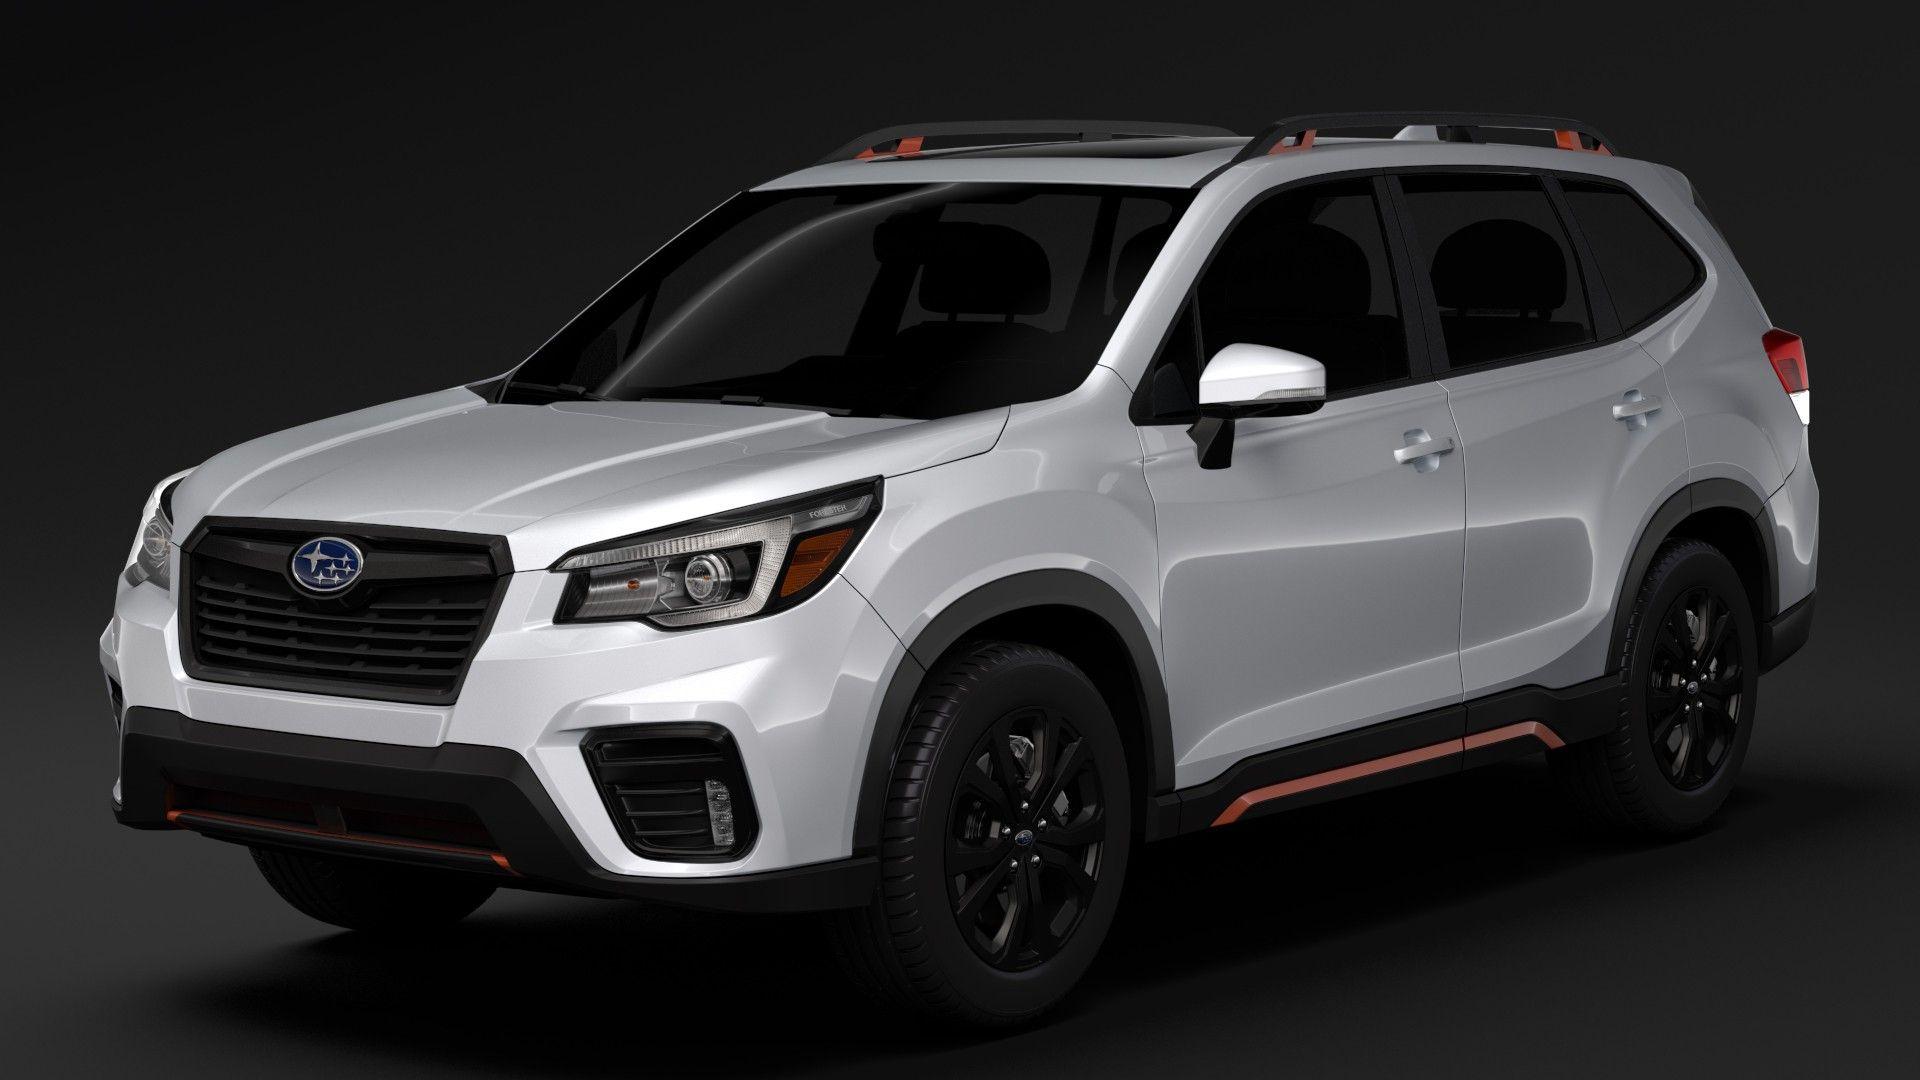 2019 Subaru Forester 3D CGI Model Subaru forester